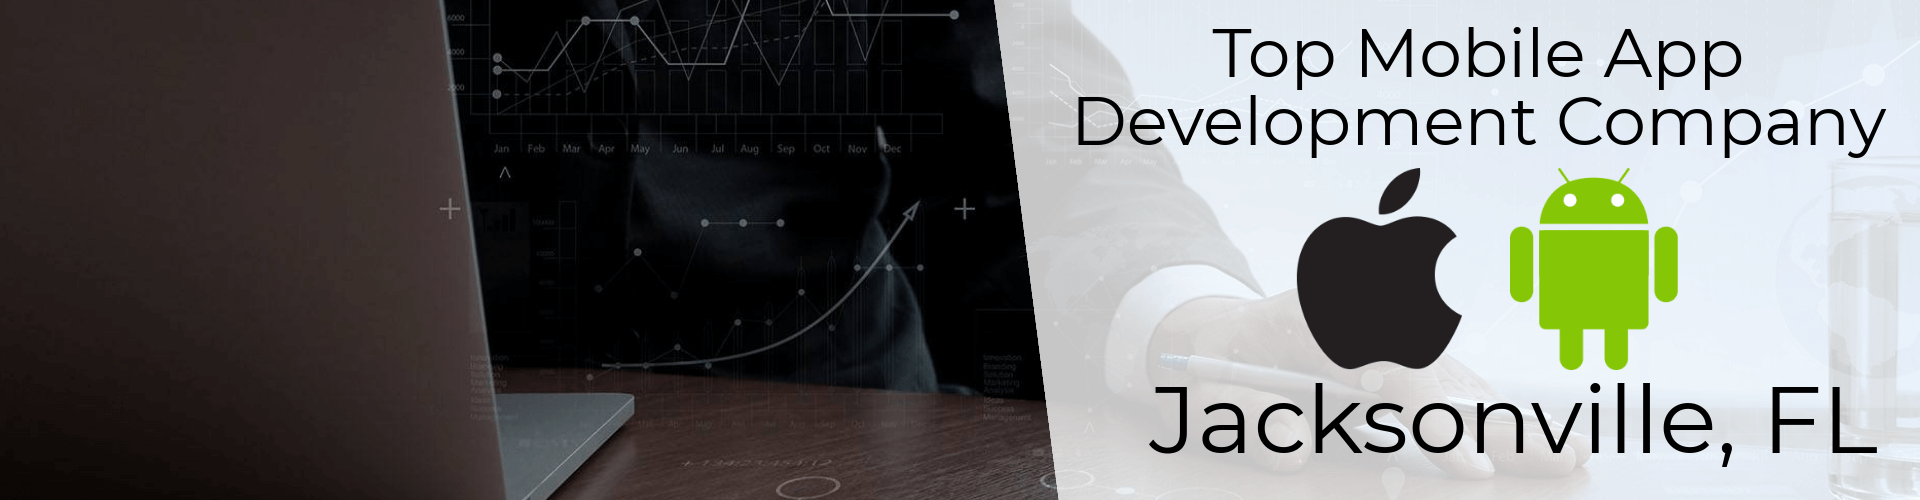 mobile app development company jacksonville